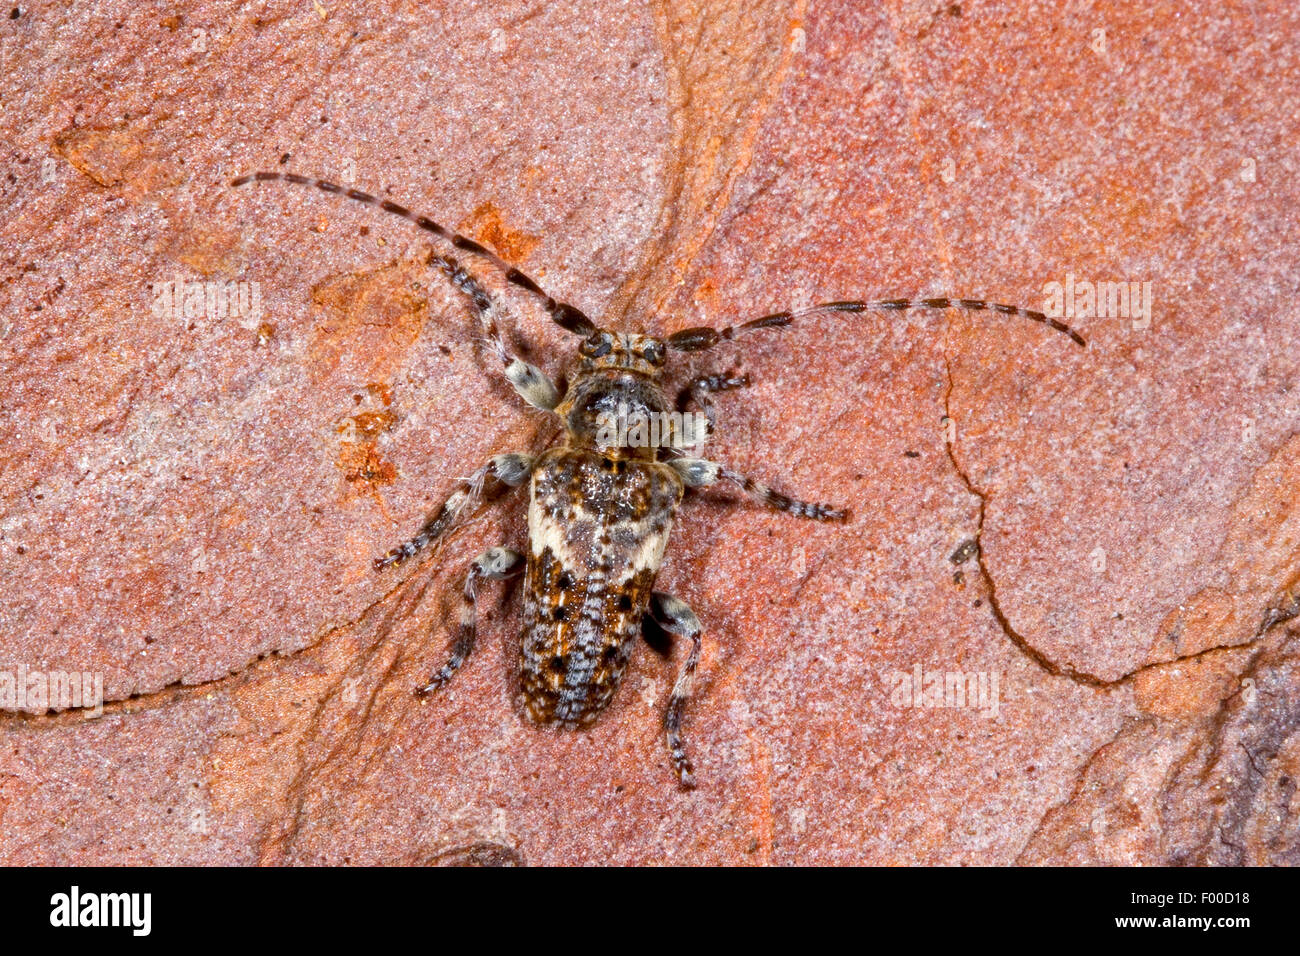 Conifer-wood longhorn beetle, Pine Longhorn (Pogonocherus fasciculatus), on bark, Germany Stock Photo